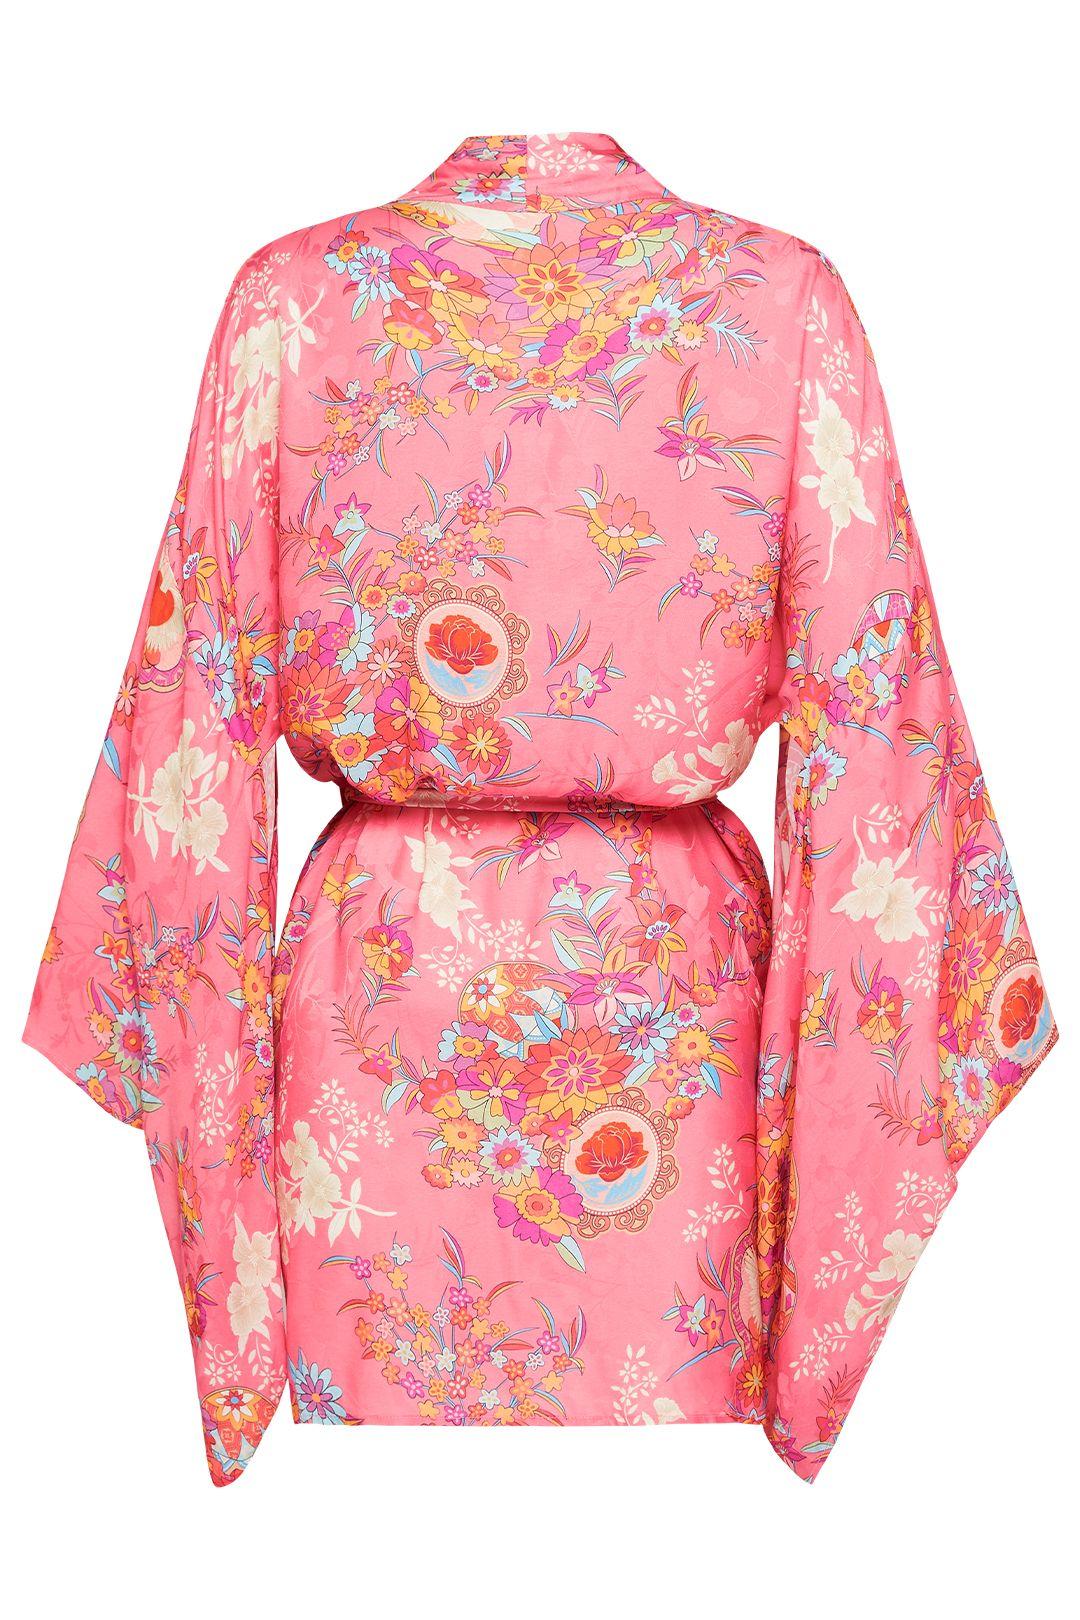 Spell Leo Short Robe Pink Floral Satin